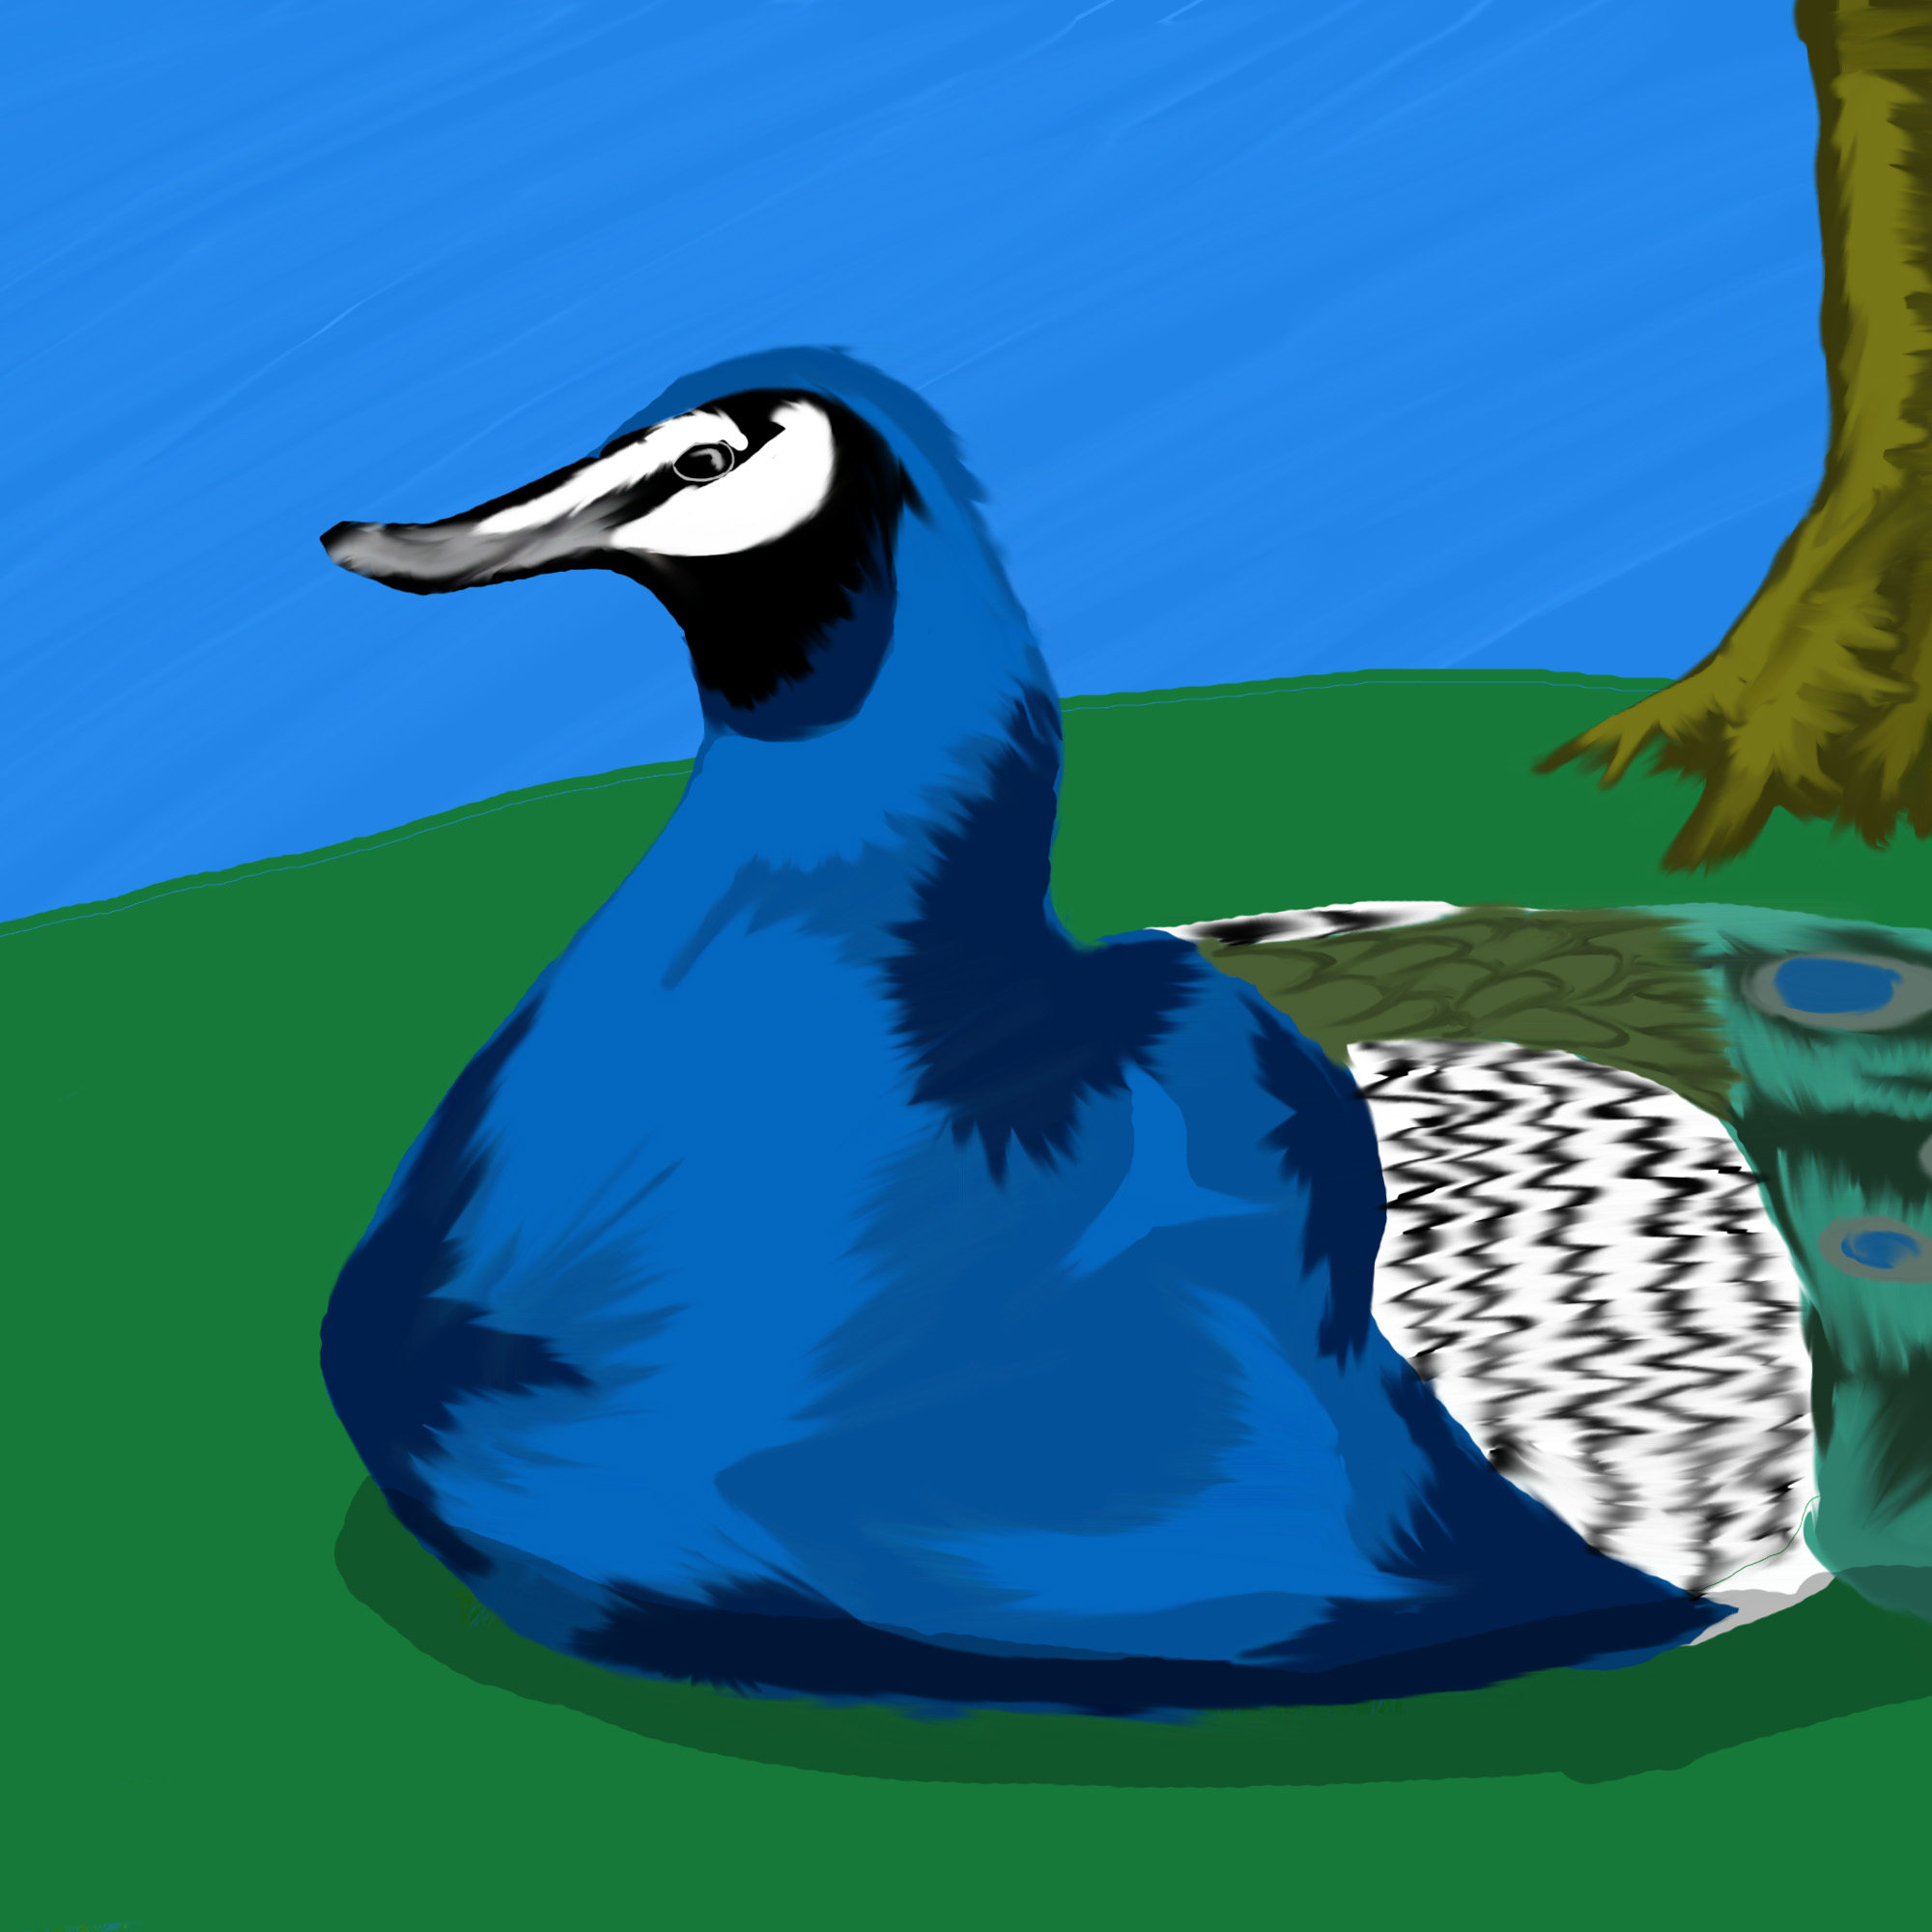 Peacock-Duck Hybrid